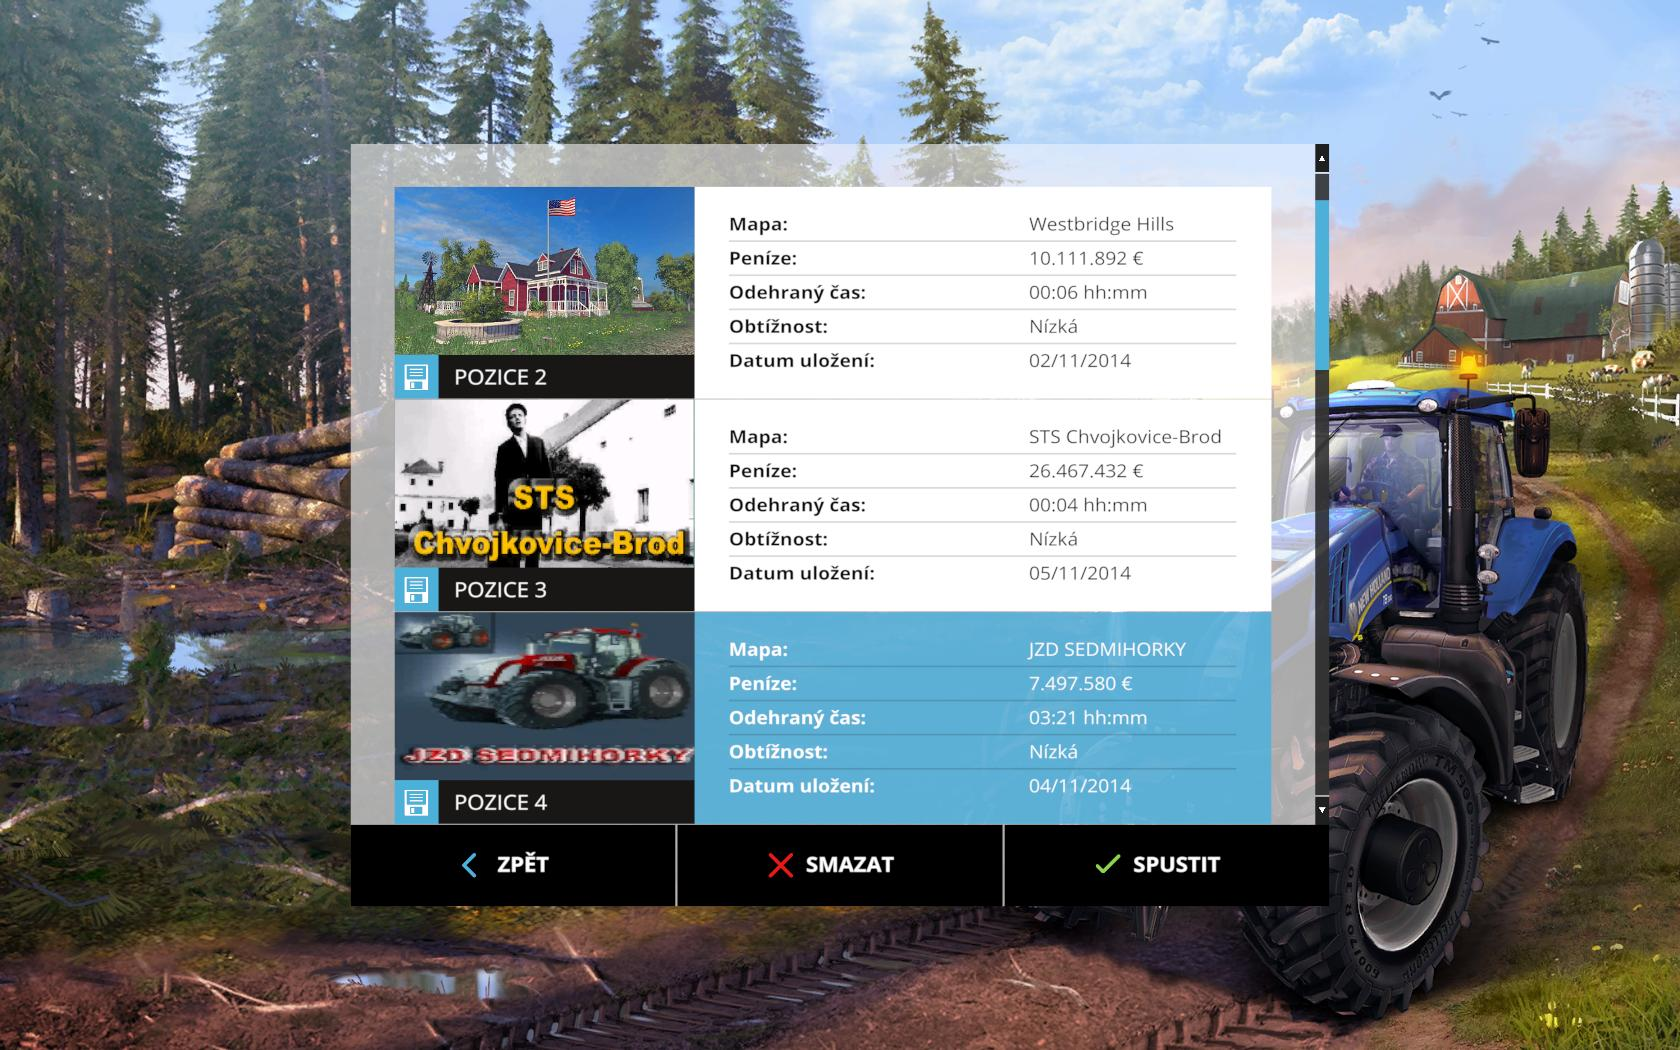 STS CHVOJKOVICE-BROD V1.0 MAP - Farming simulator 2015 / 15 LS mod